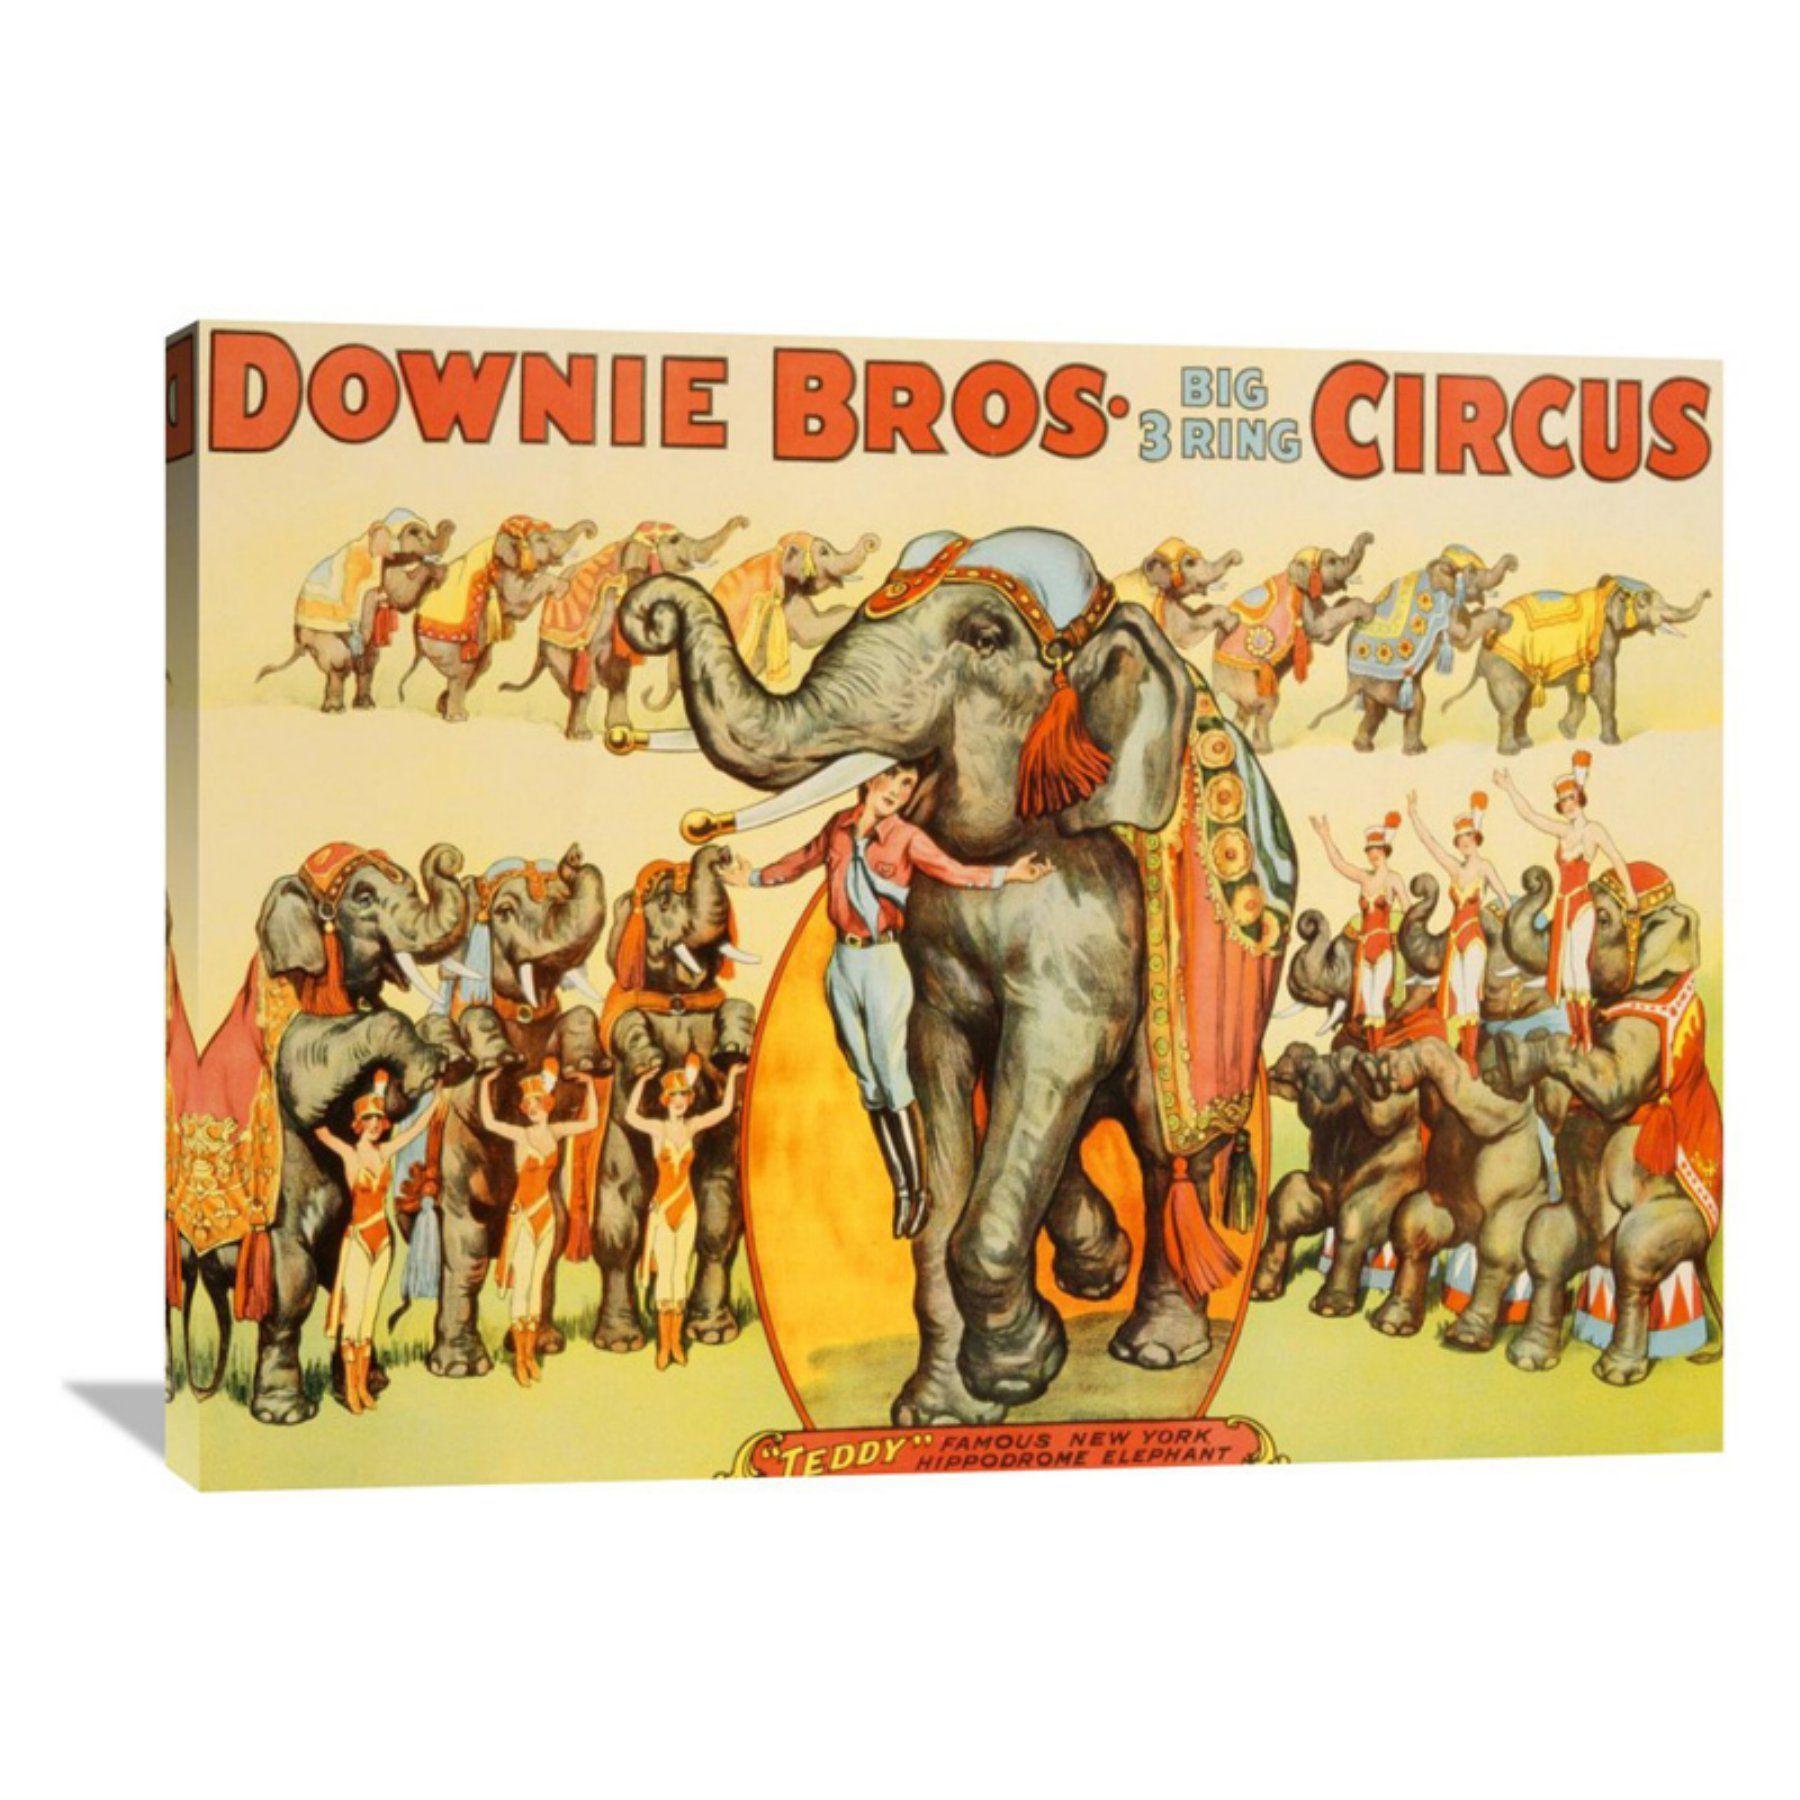 Global Gallery Downie Bros. Big 3 Ring Circus 1935 Wall Art - GCS ...